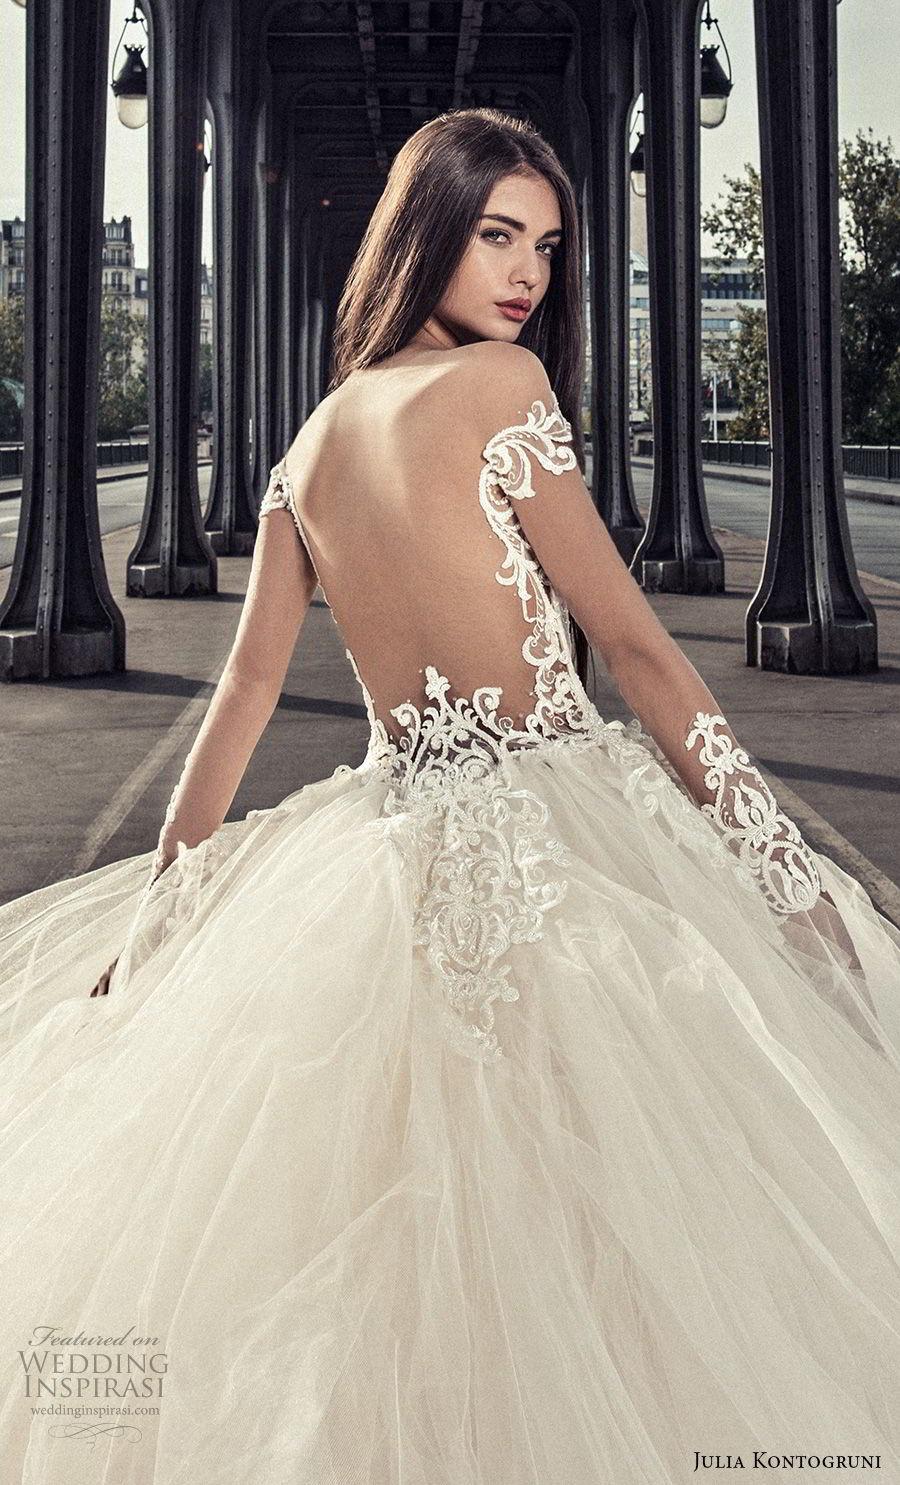 julia kontogruni 2018 bridal long sleeves deep plunging v neck heavily embellished bodice princess ball gown wedding dress open back royal train (2) zbv